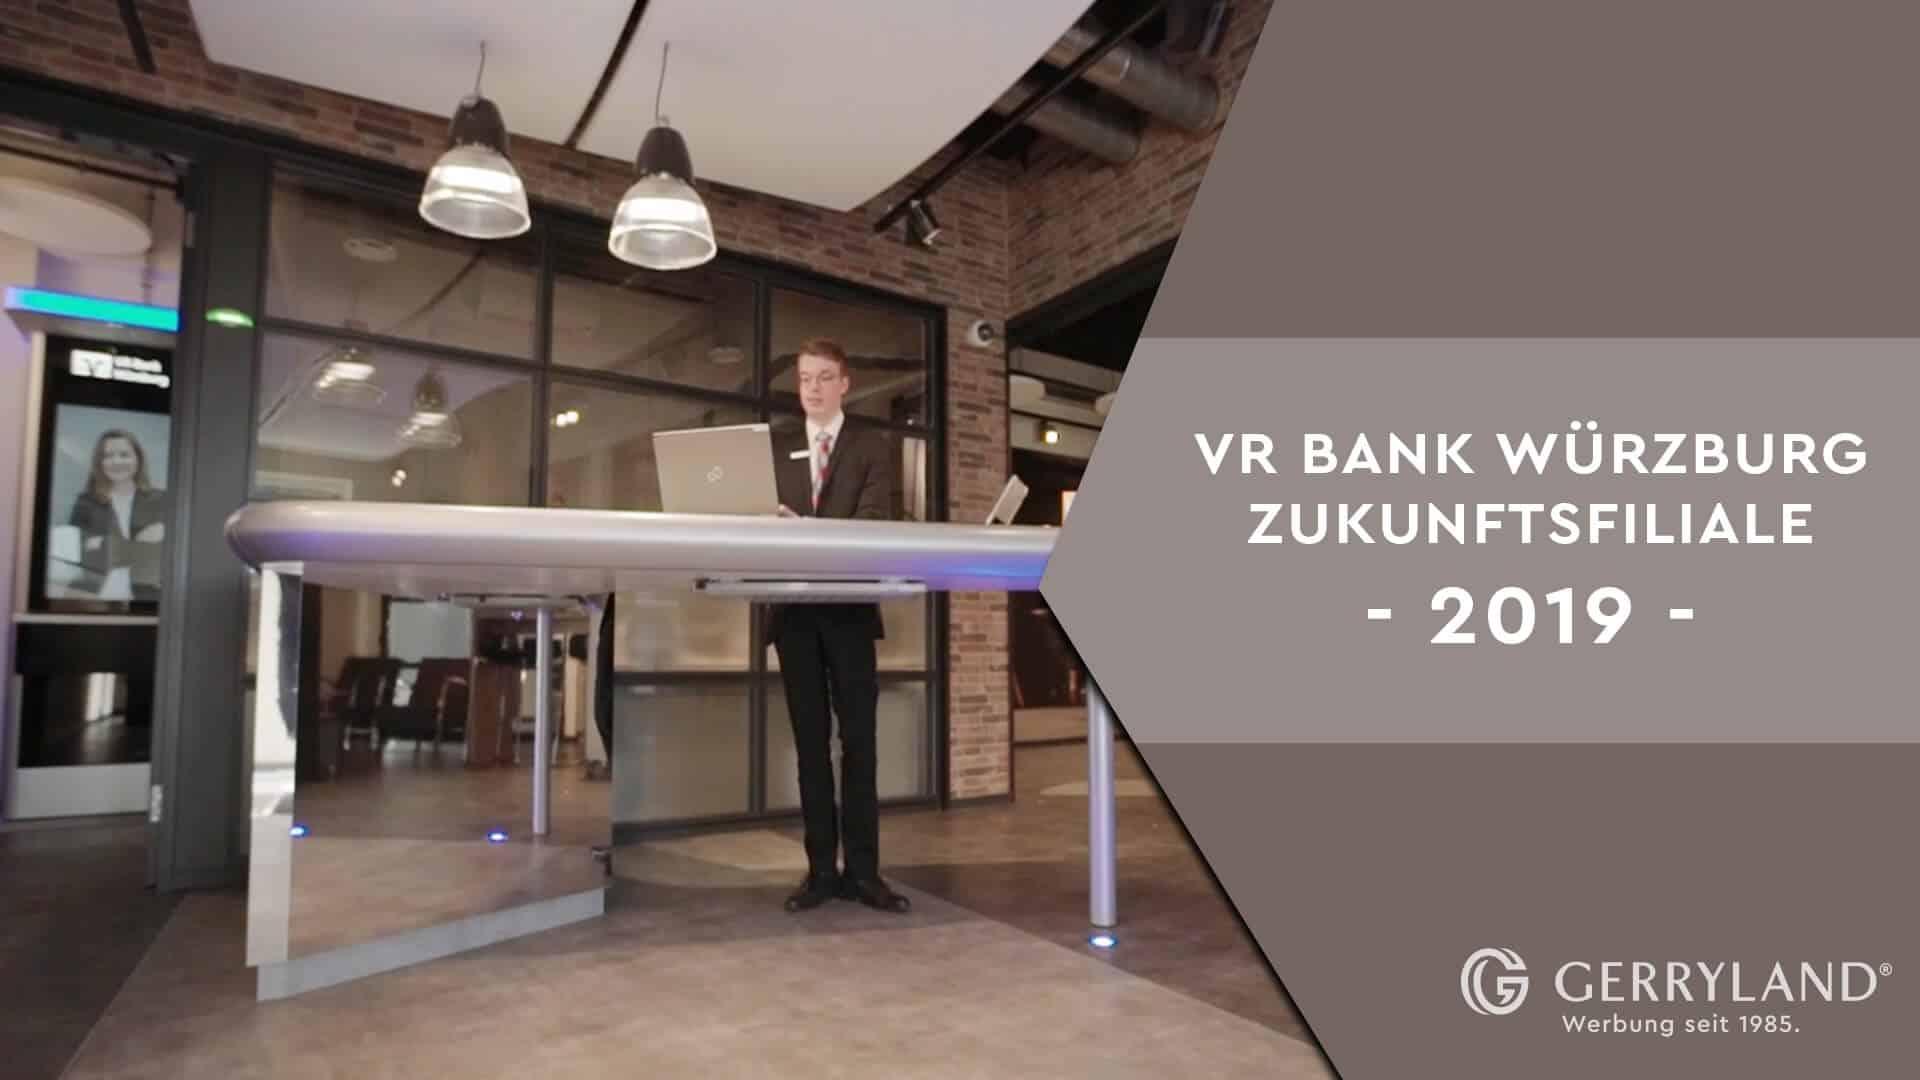 Gerryland-Youtube-Neukonzipierung-VR-Bank-Video-Zukunftsfiliale_Thumb